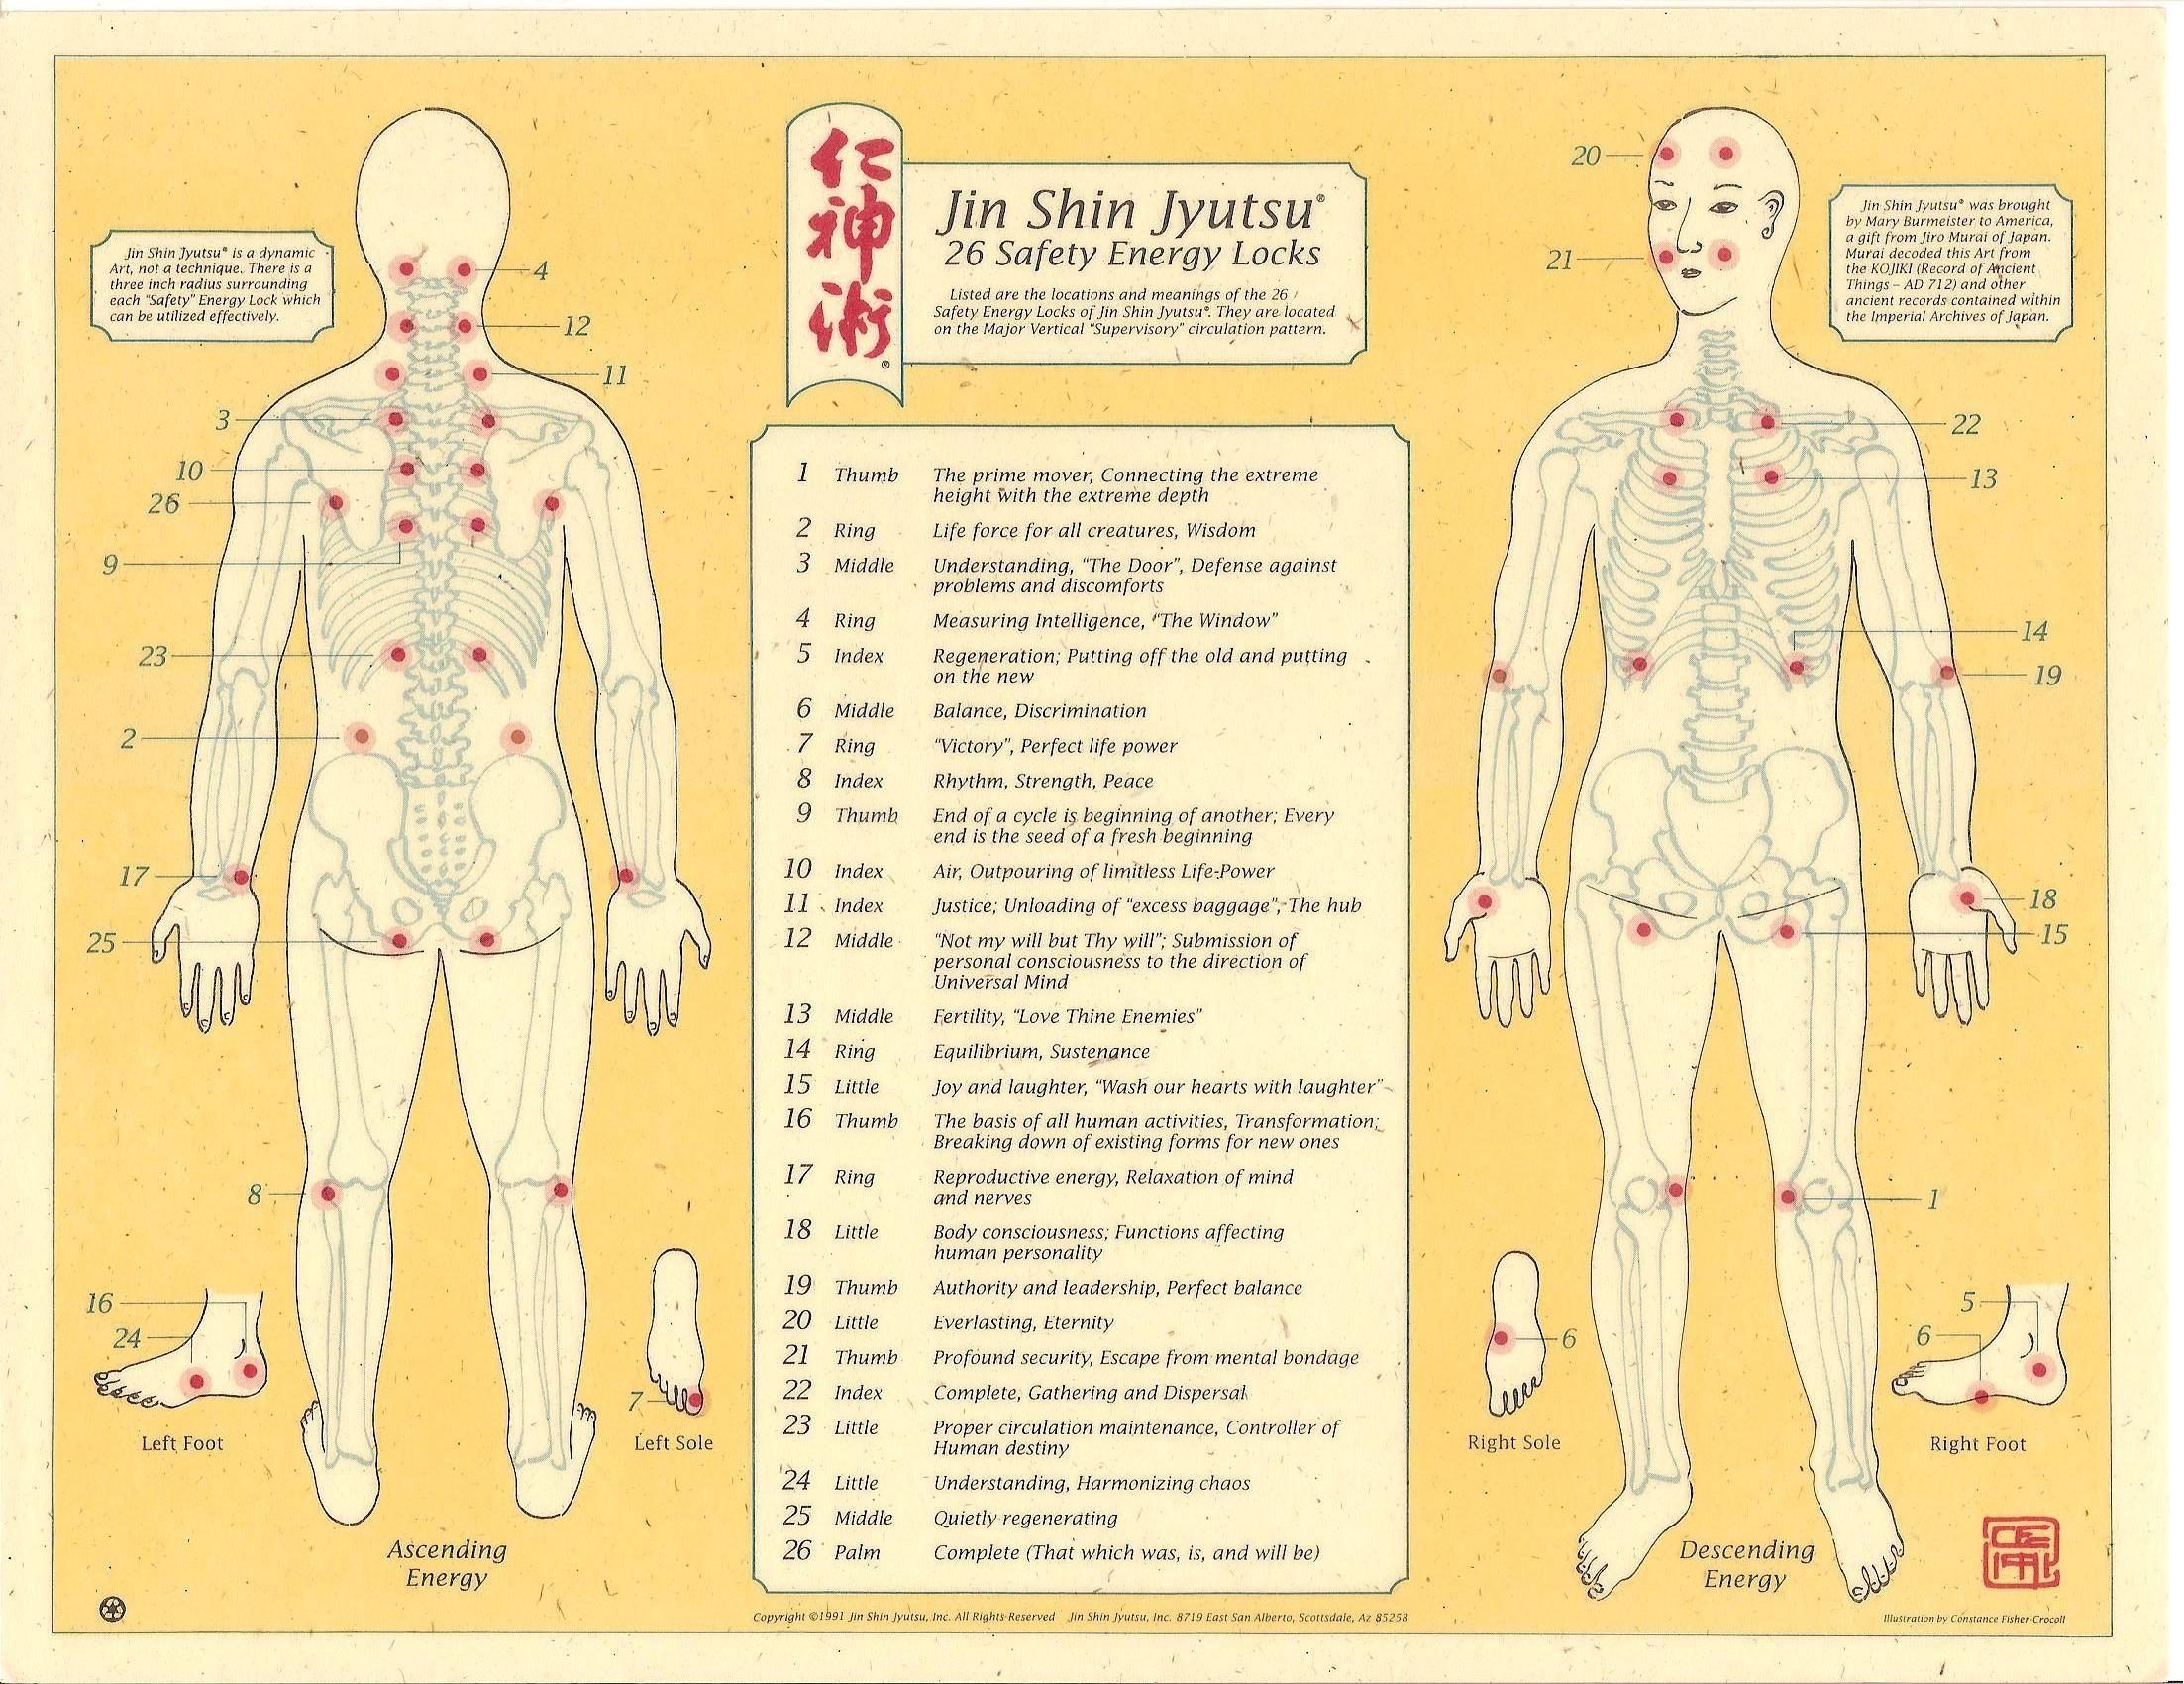 Jin Shin Jyutsu - Jin Shin Jyutsu | Health Advisor | Pinterest